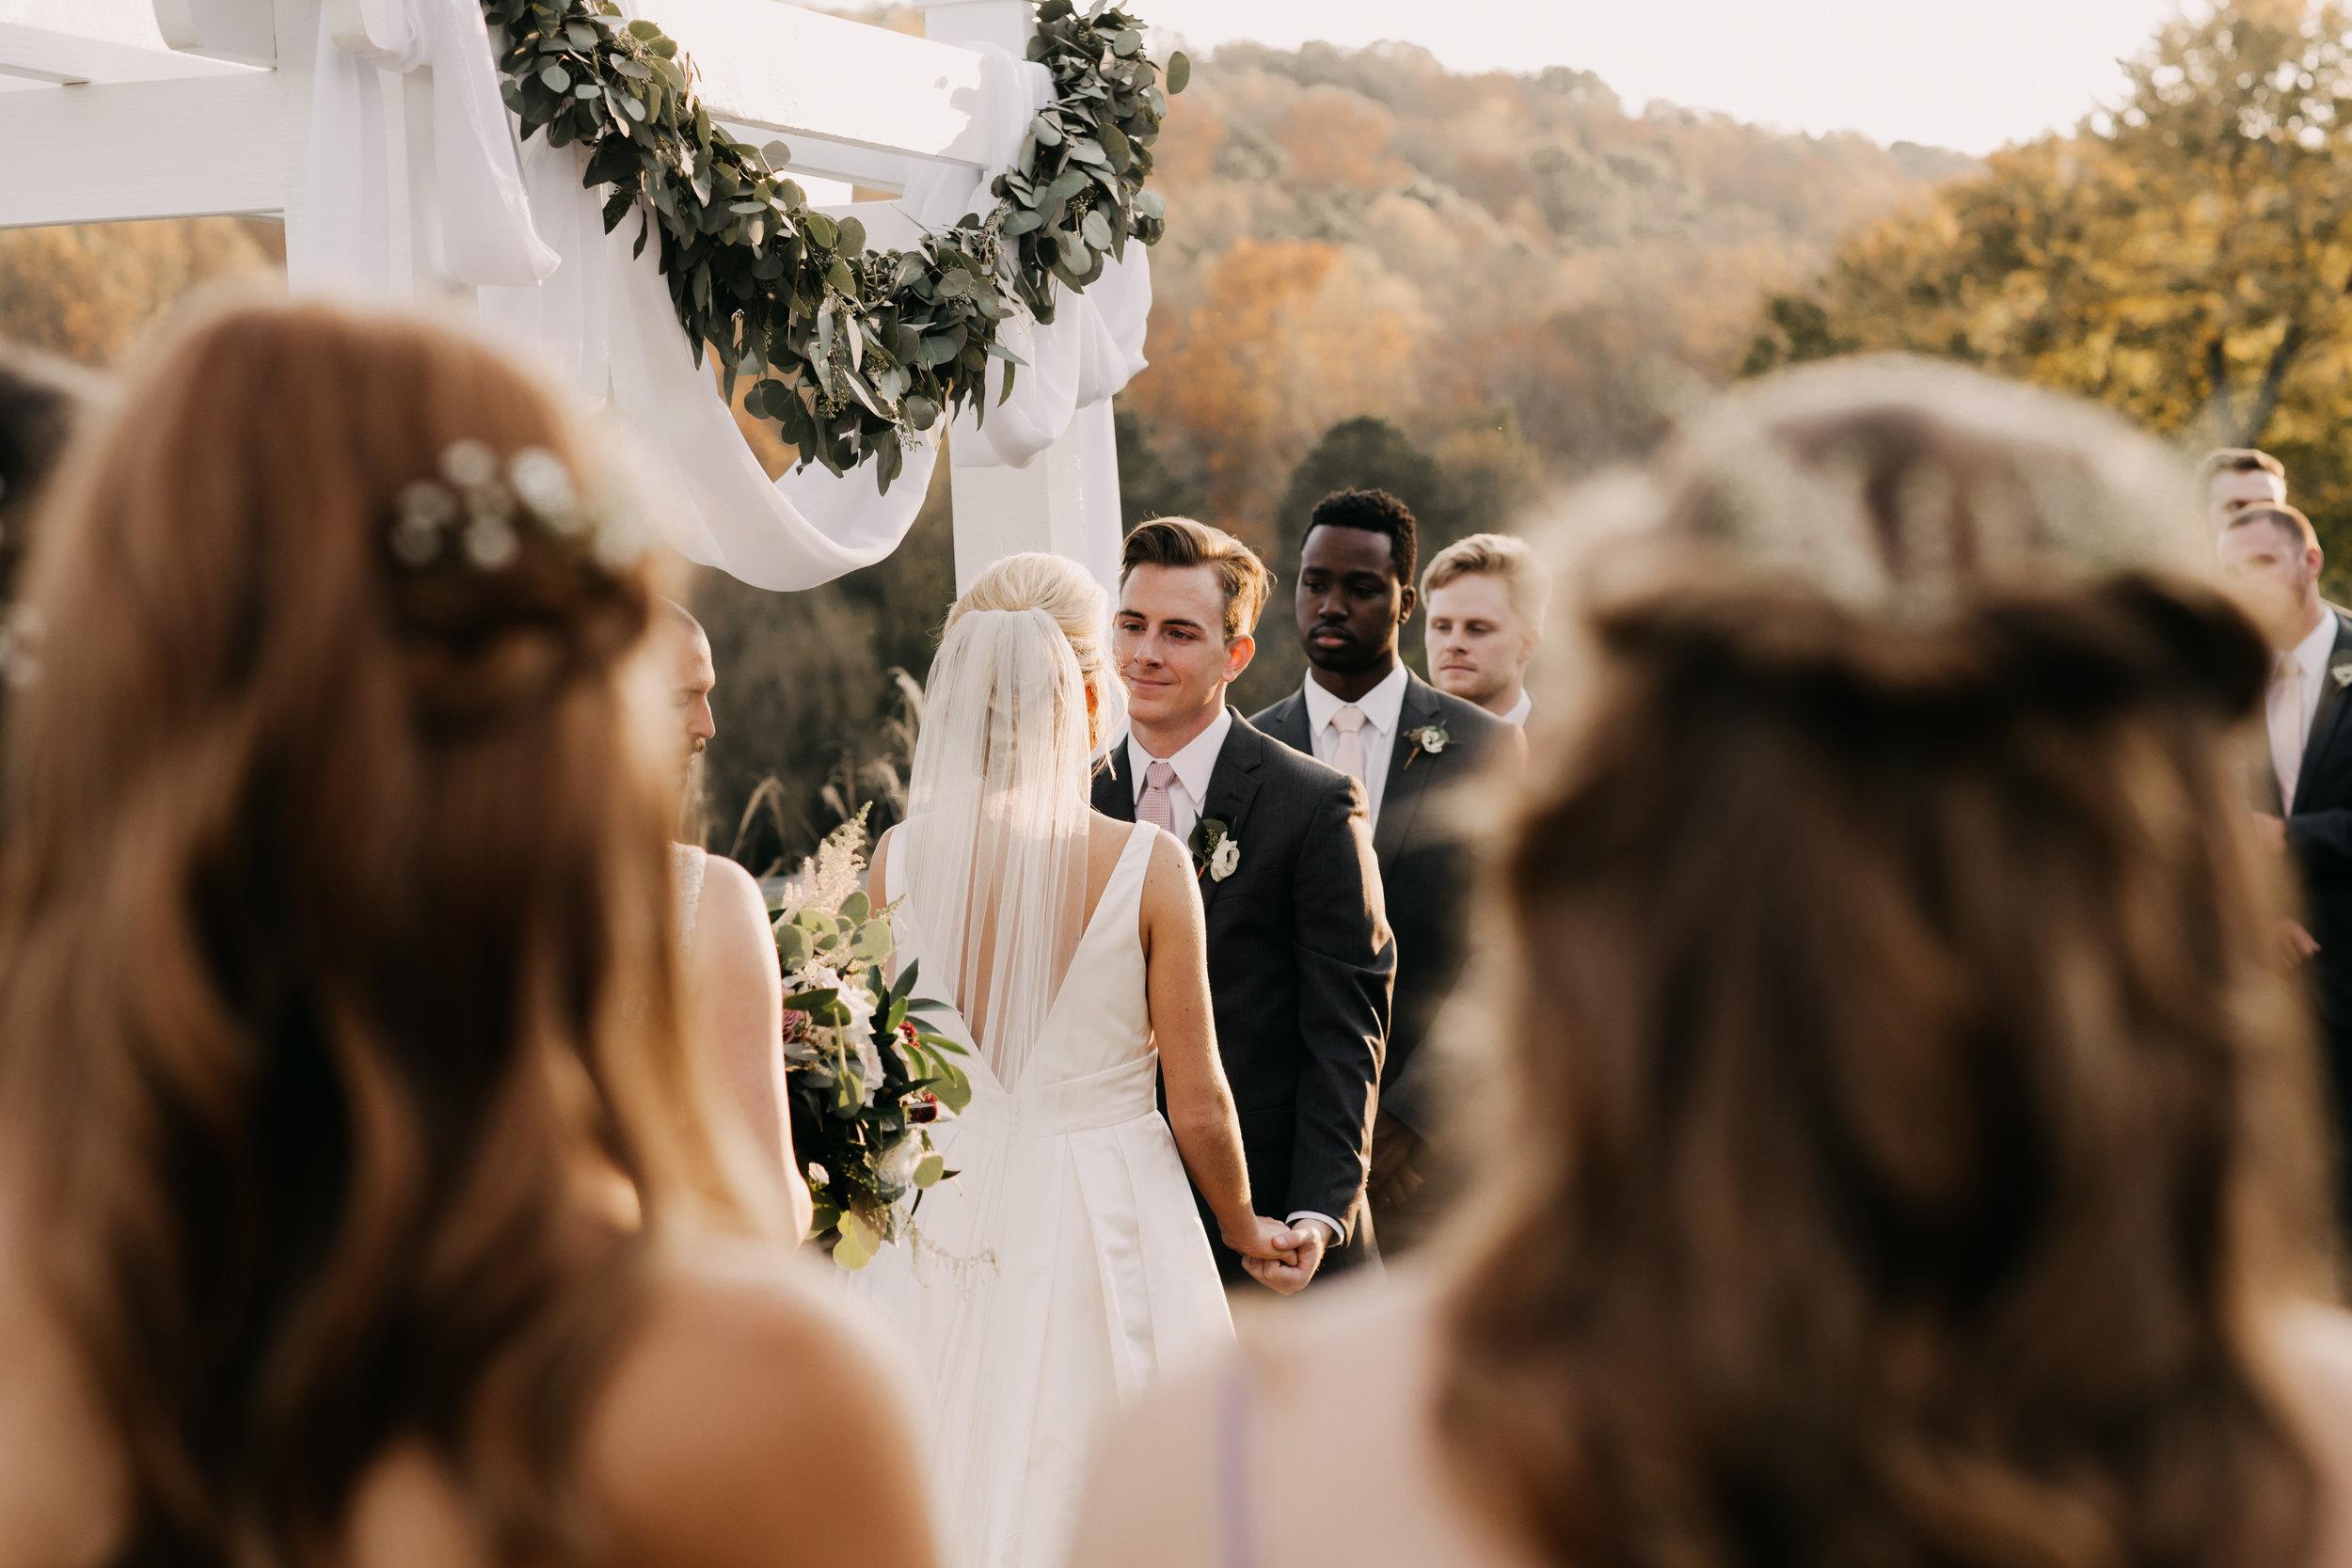 Kaylyn & Ryan Final Wedding Photos359.jpg